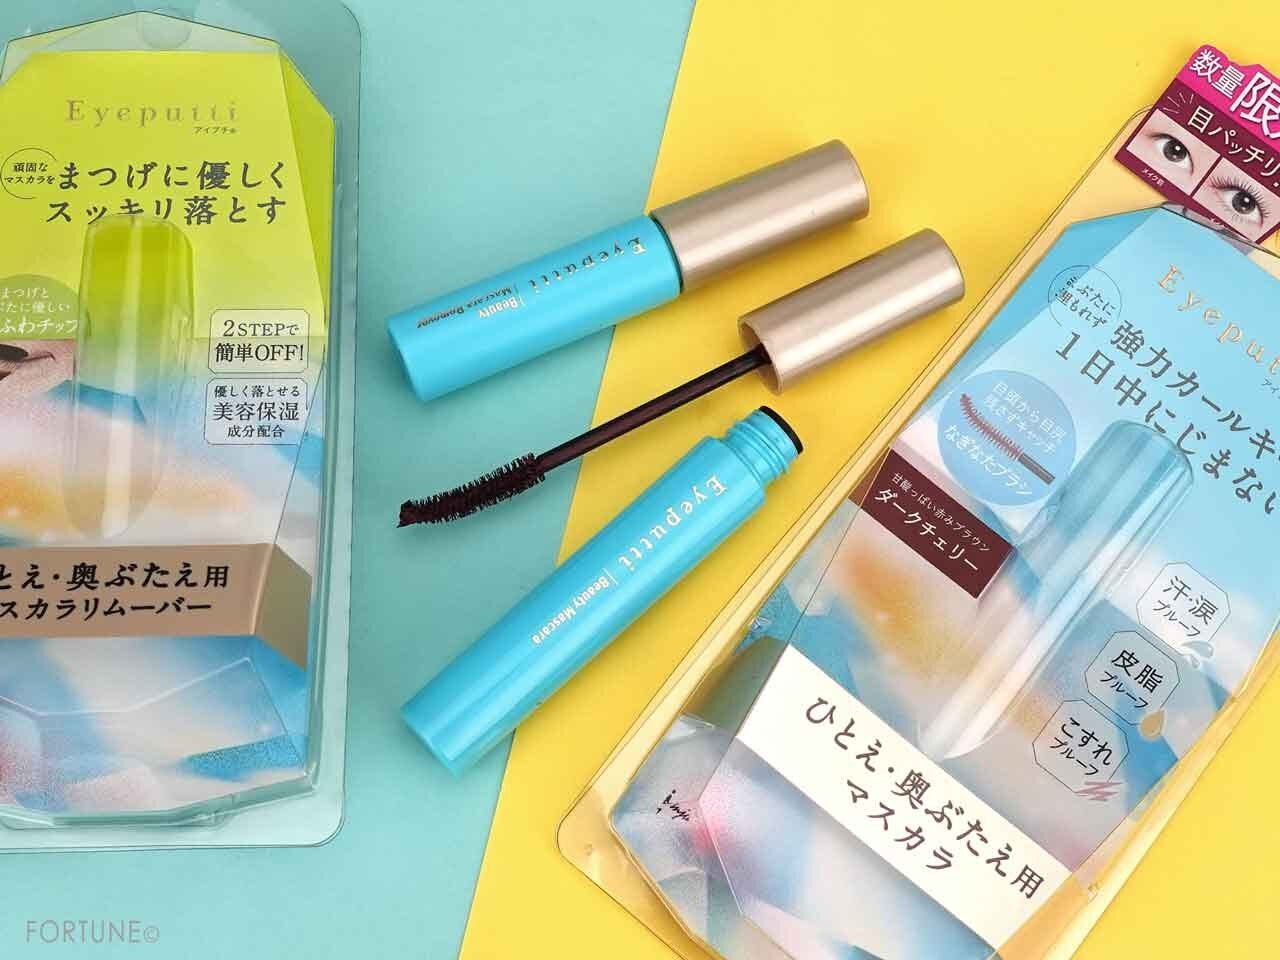 Eyeputti/アイプチ® 2021夏新作コスメ